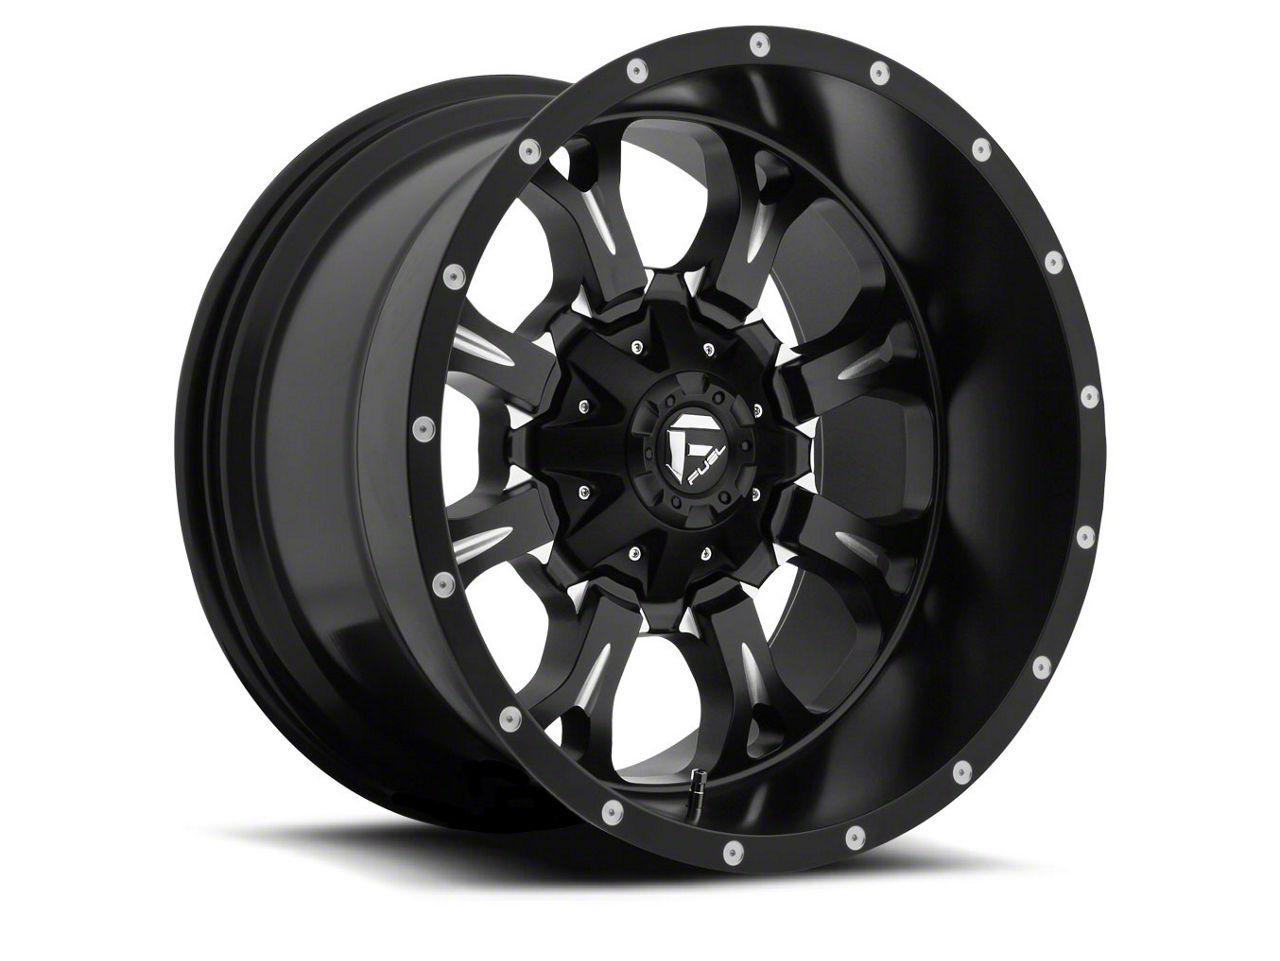 Fuel Wheels Krank Black Milled 6-Lug Wheel - 20x12 (04-18 F-150)